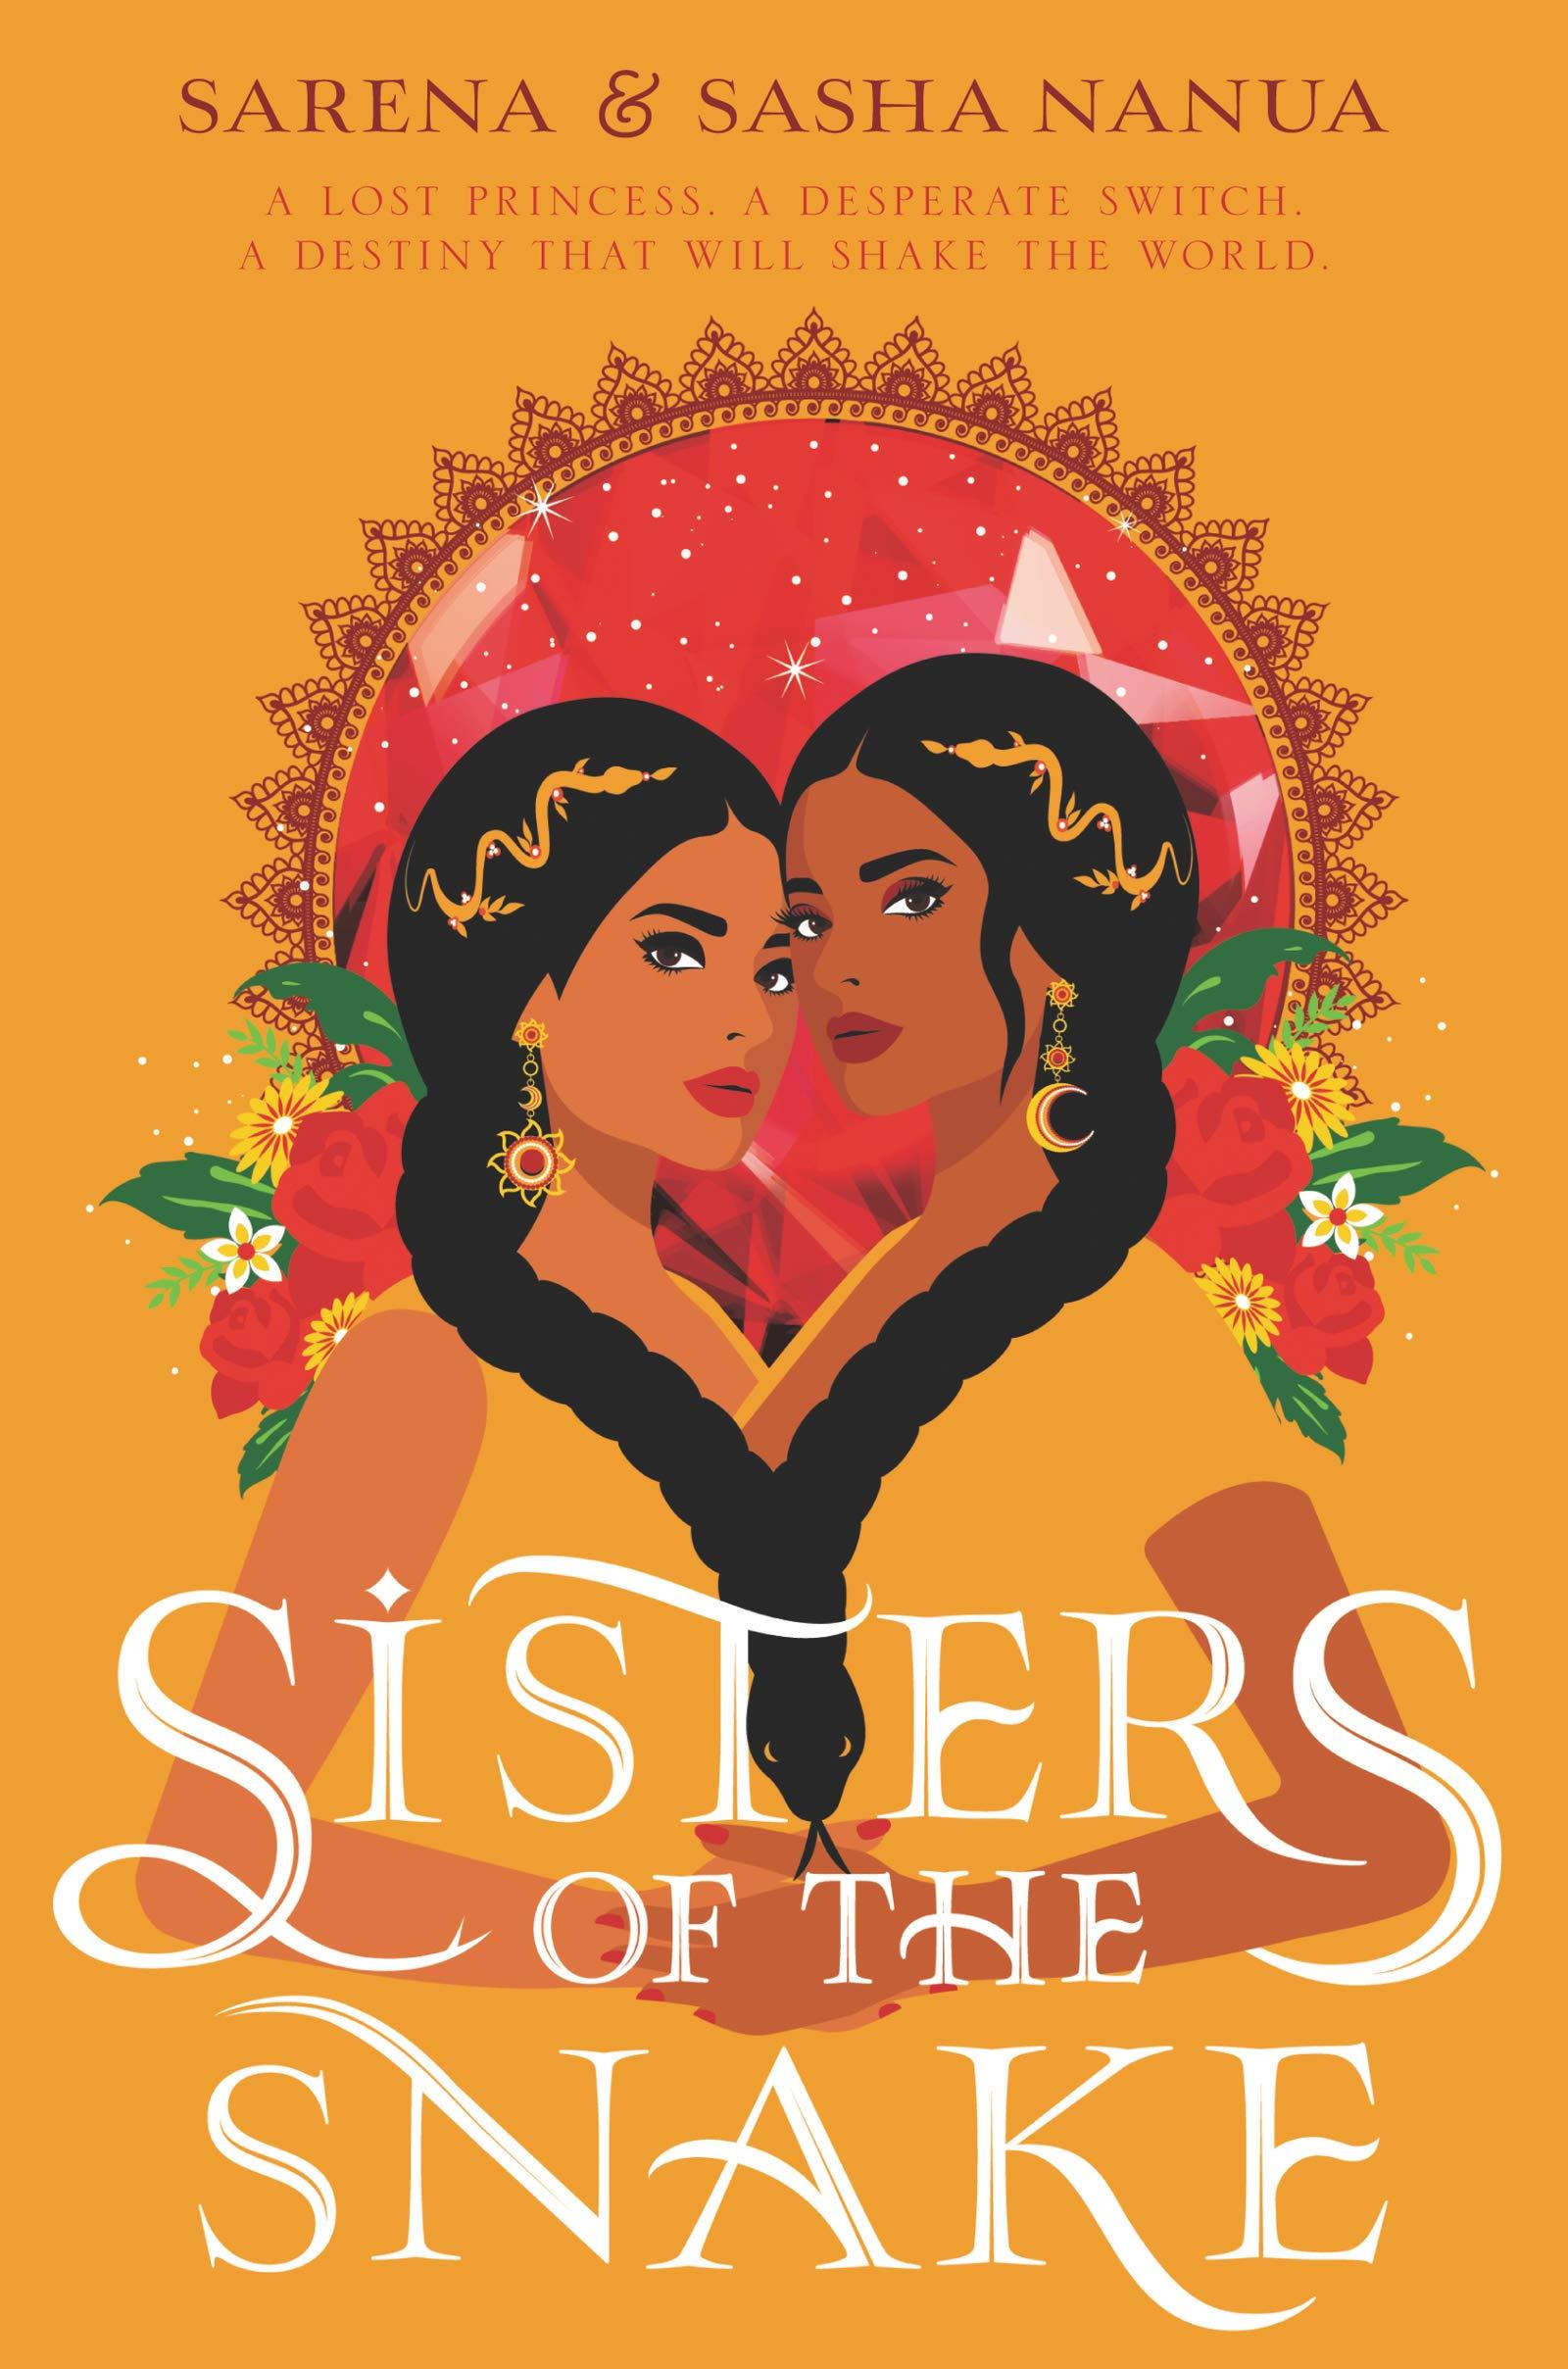 Amazon.com: Sisters of the Snake (9780062985590): Nanua, Sasha, Nanua,  Sarena: Books